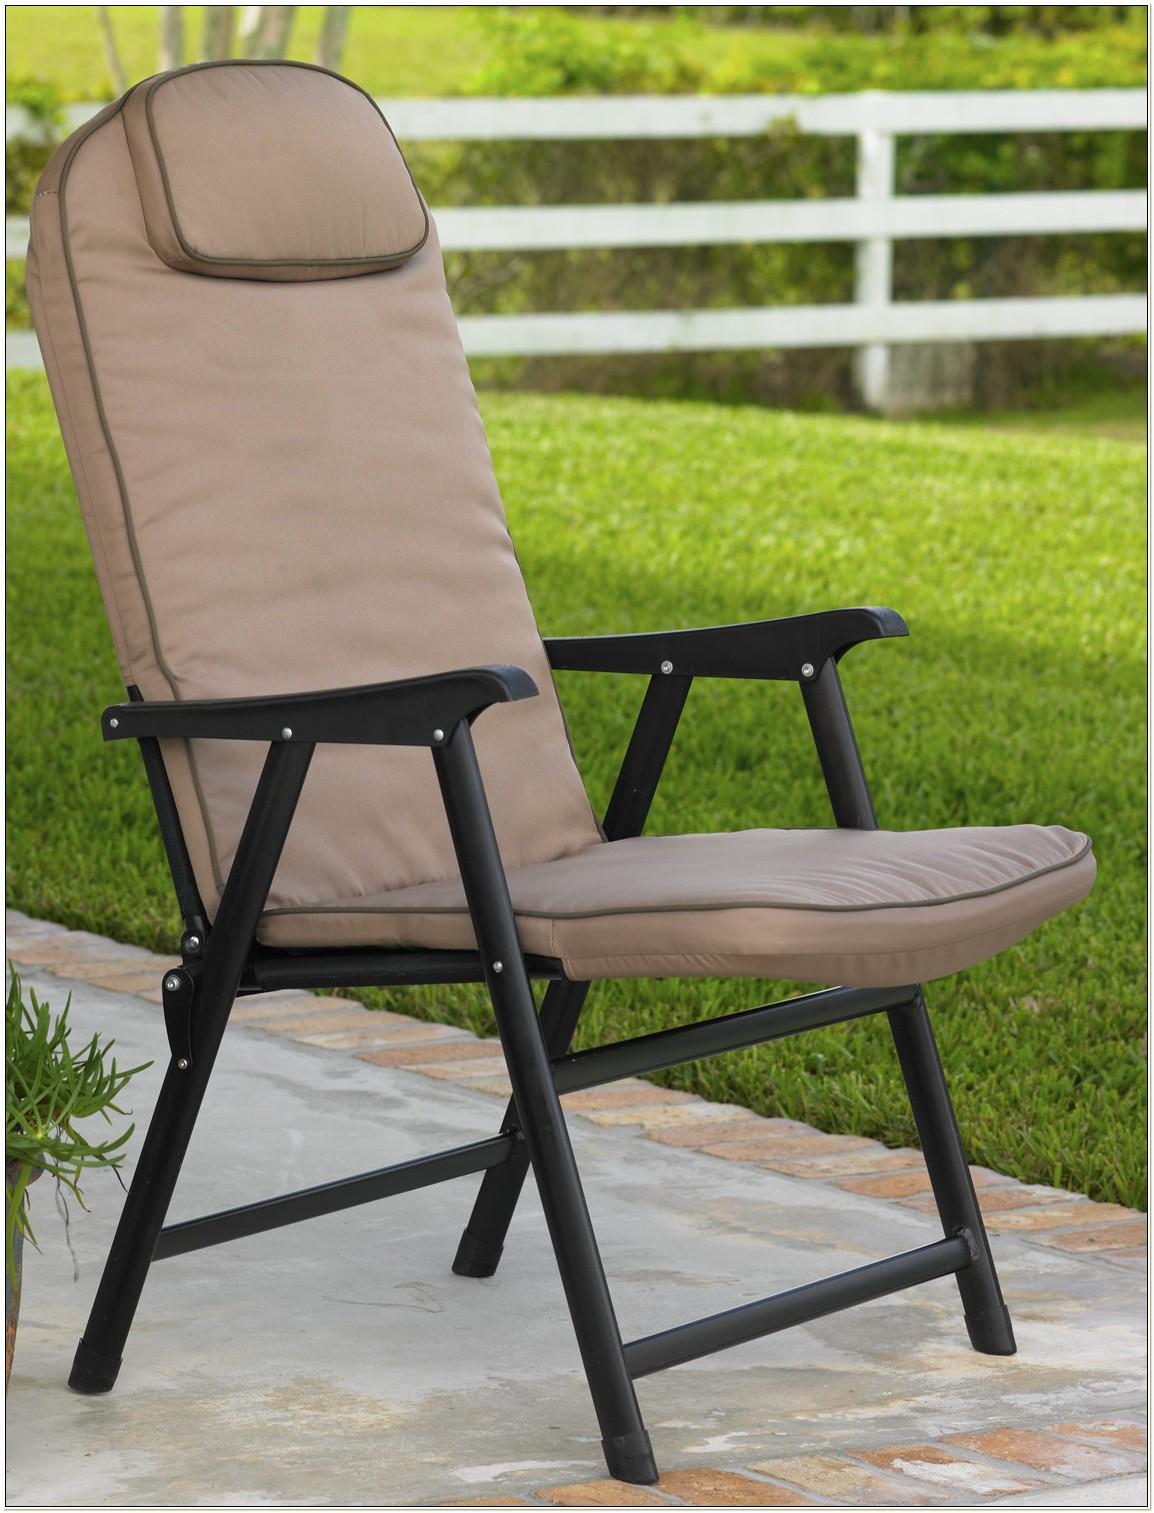 Heavy Duty Folding Outdoor Chairs